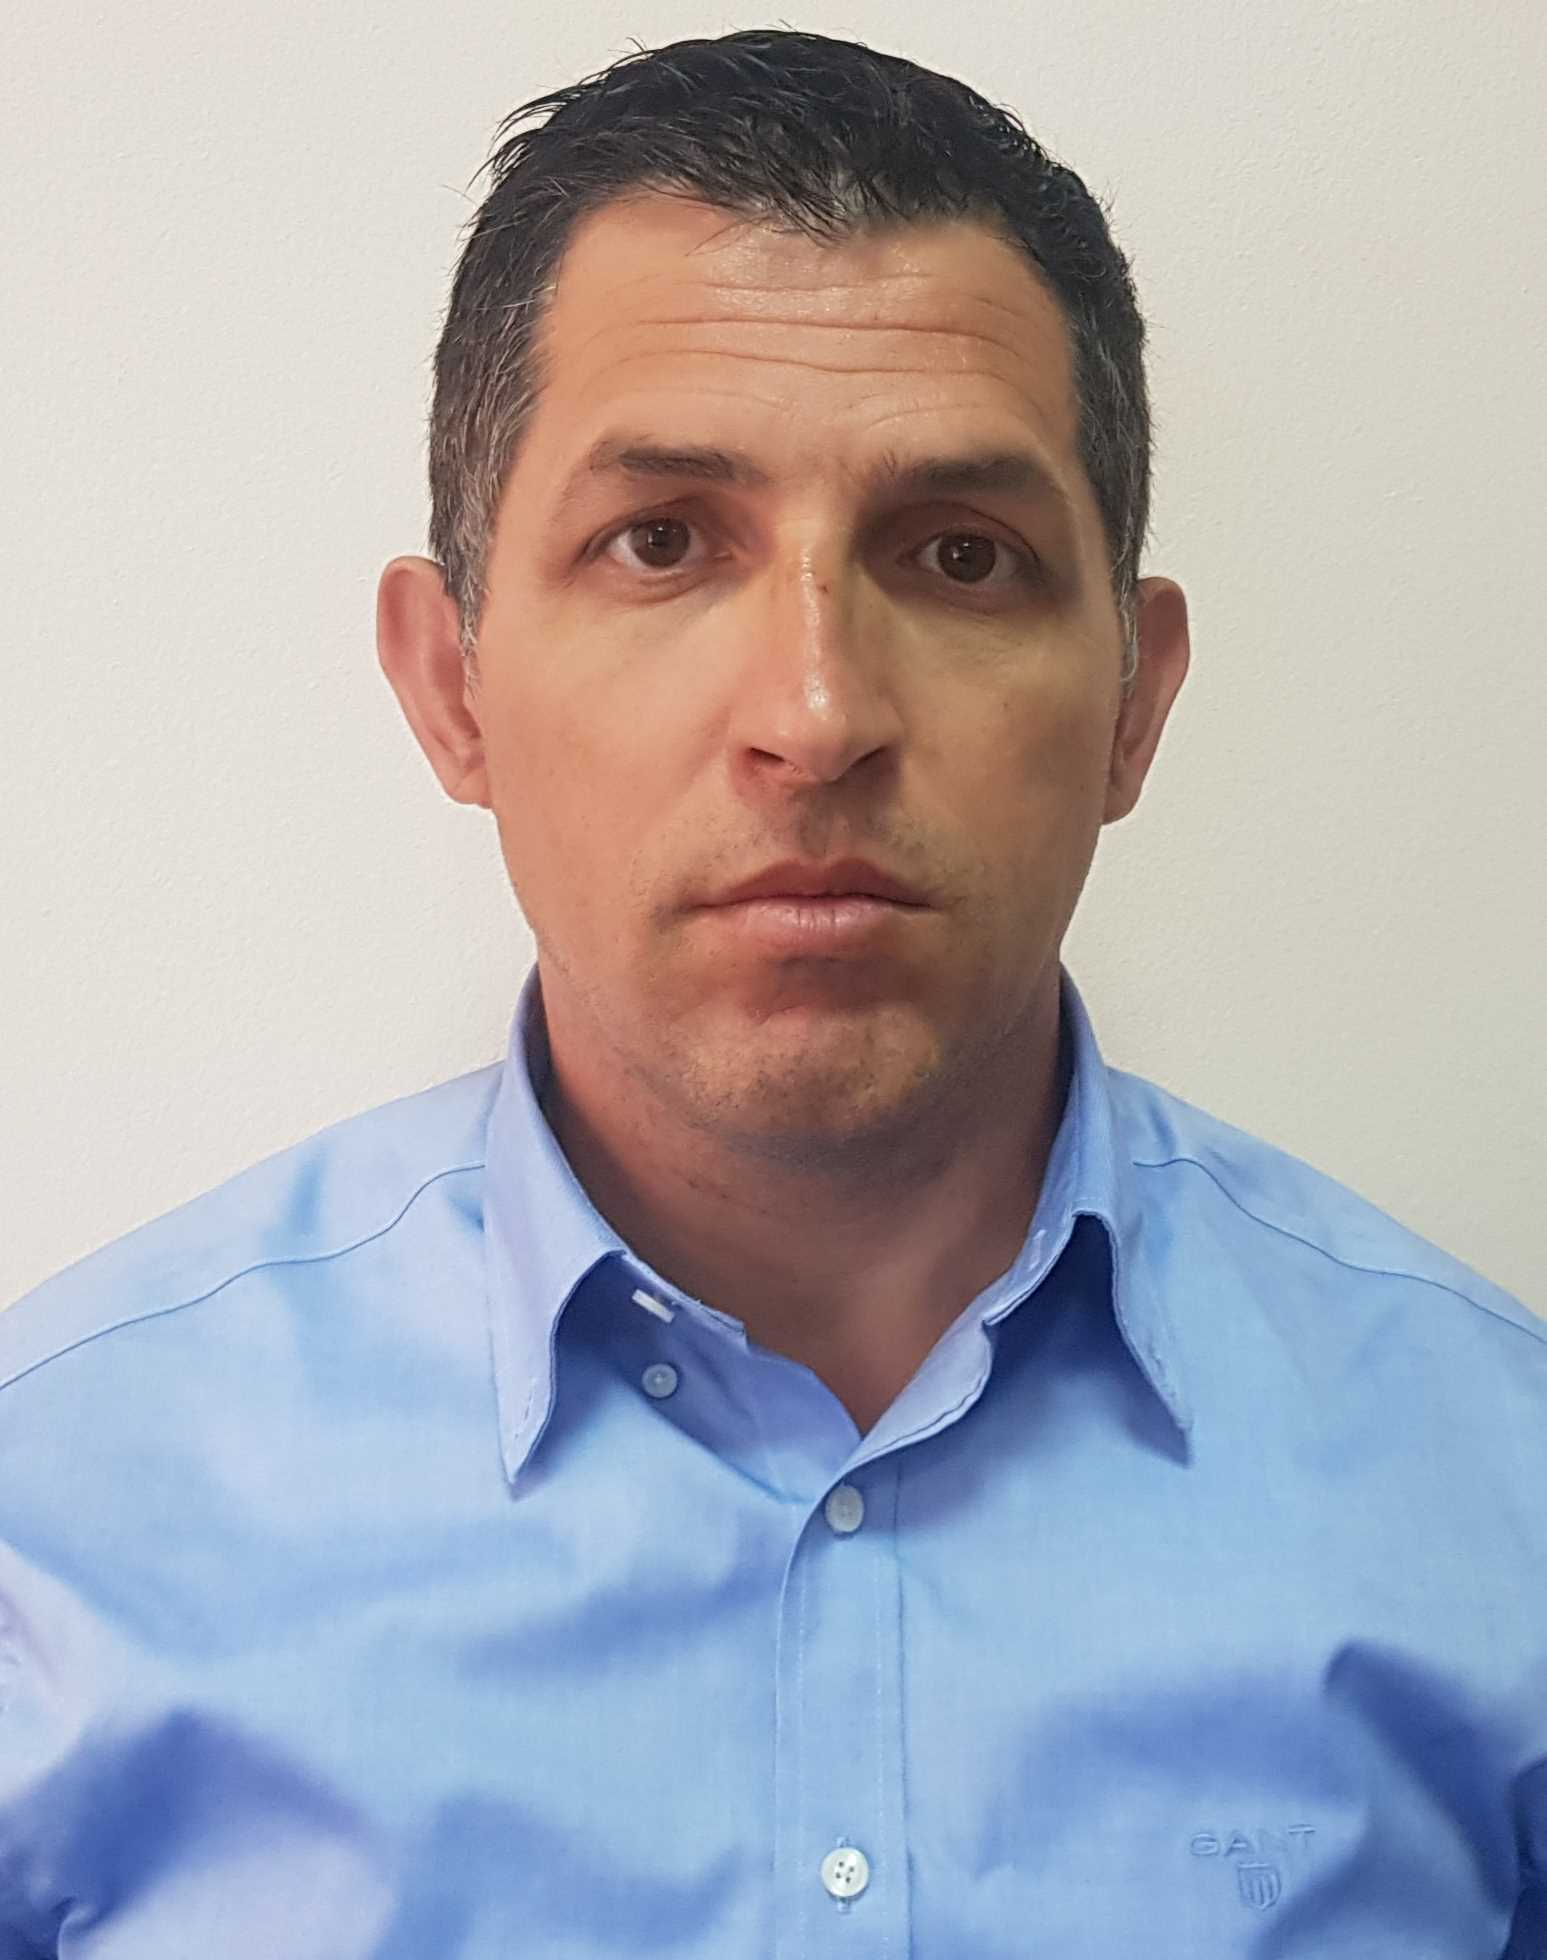 Kajtaz Bllaca